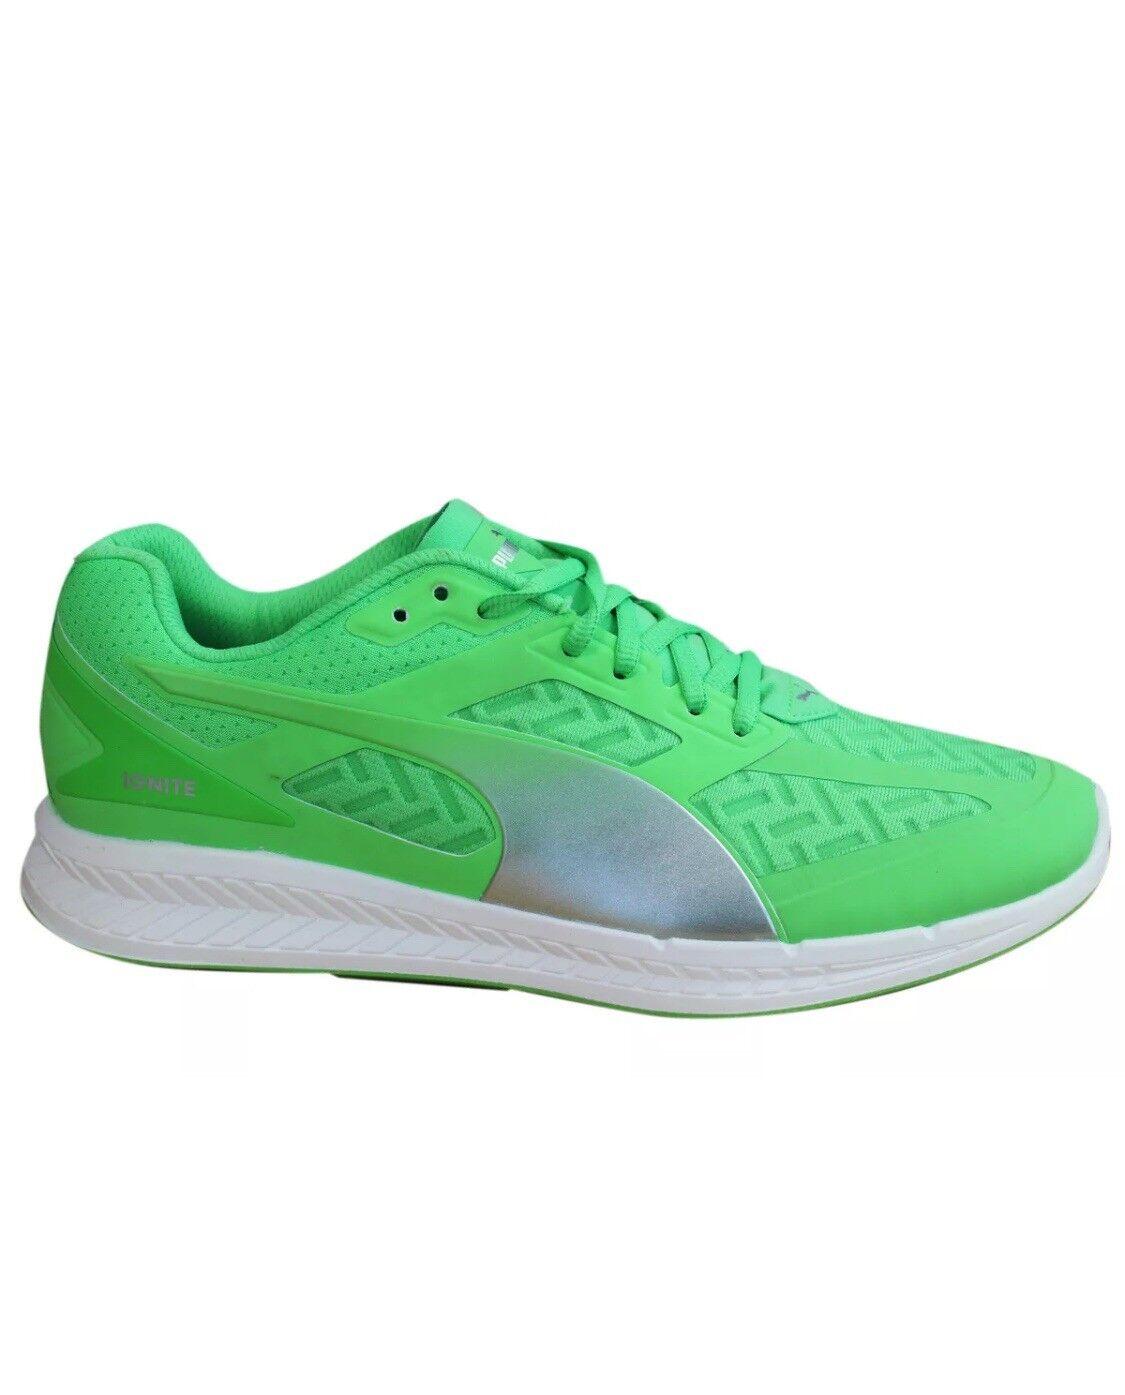 Puma Mens Ignite PowerCool Running Shoe Fluorescent Green/Silver